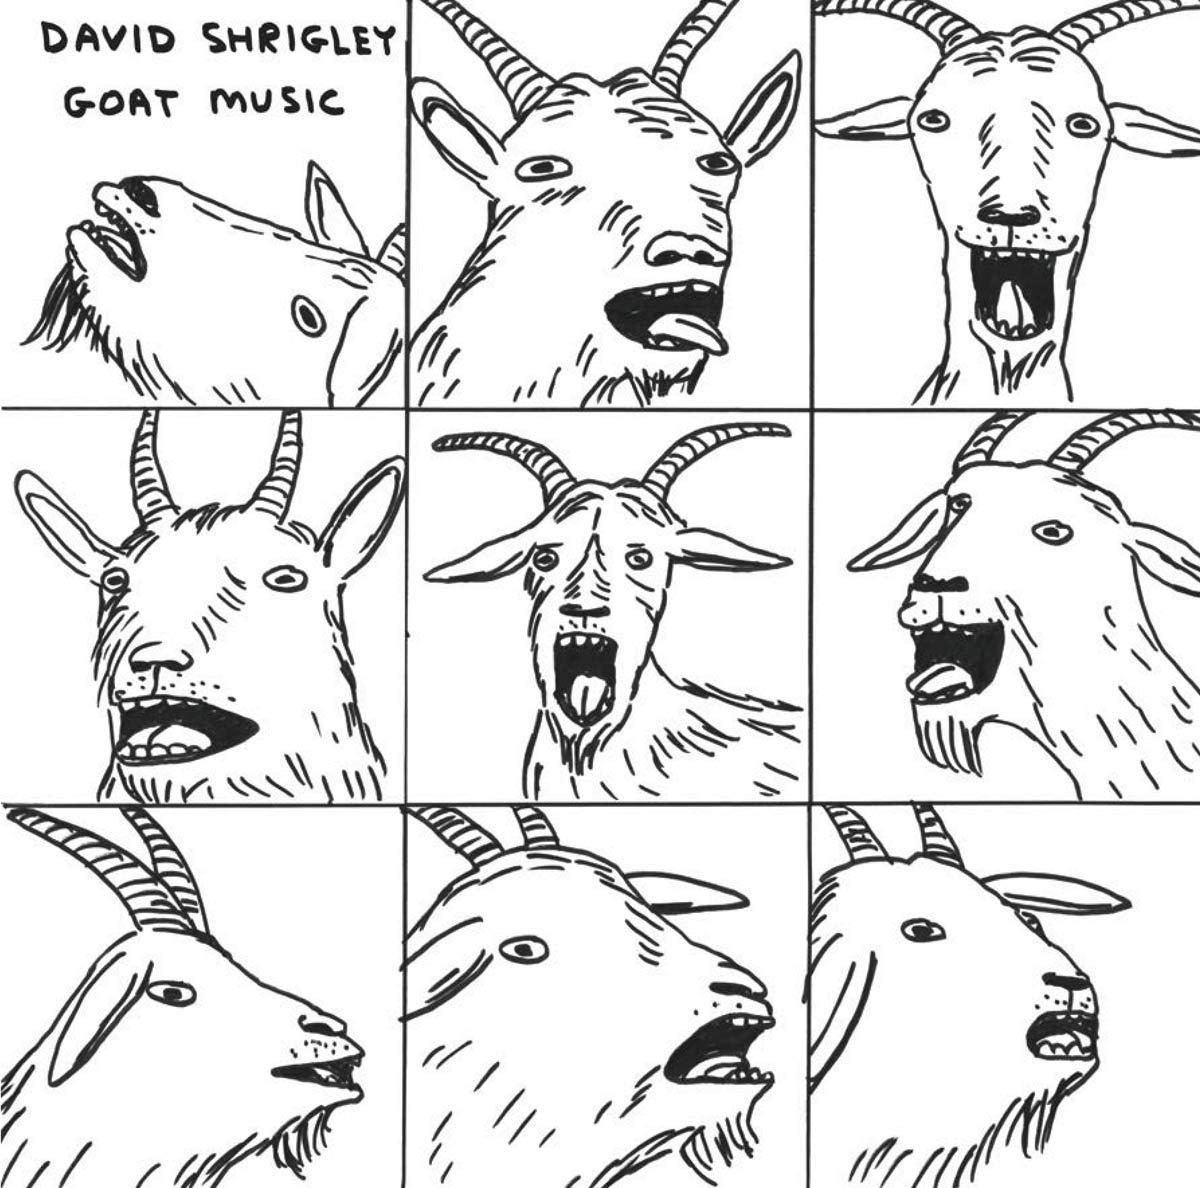 David Shrigley  Goat Music